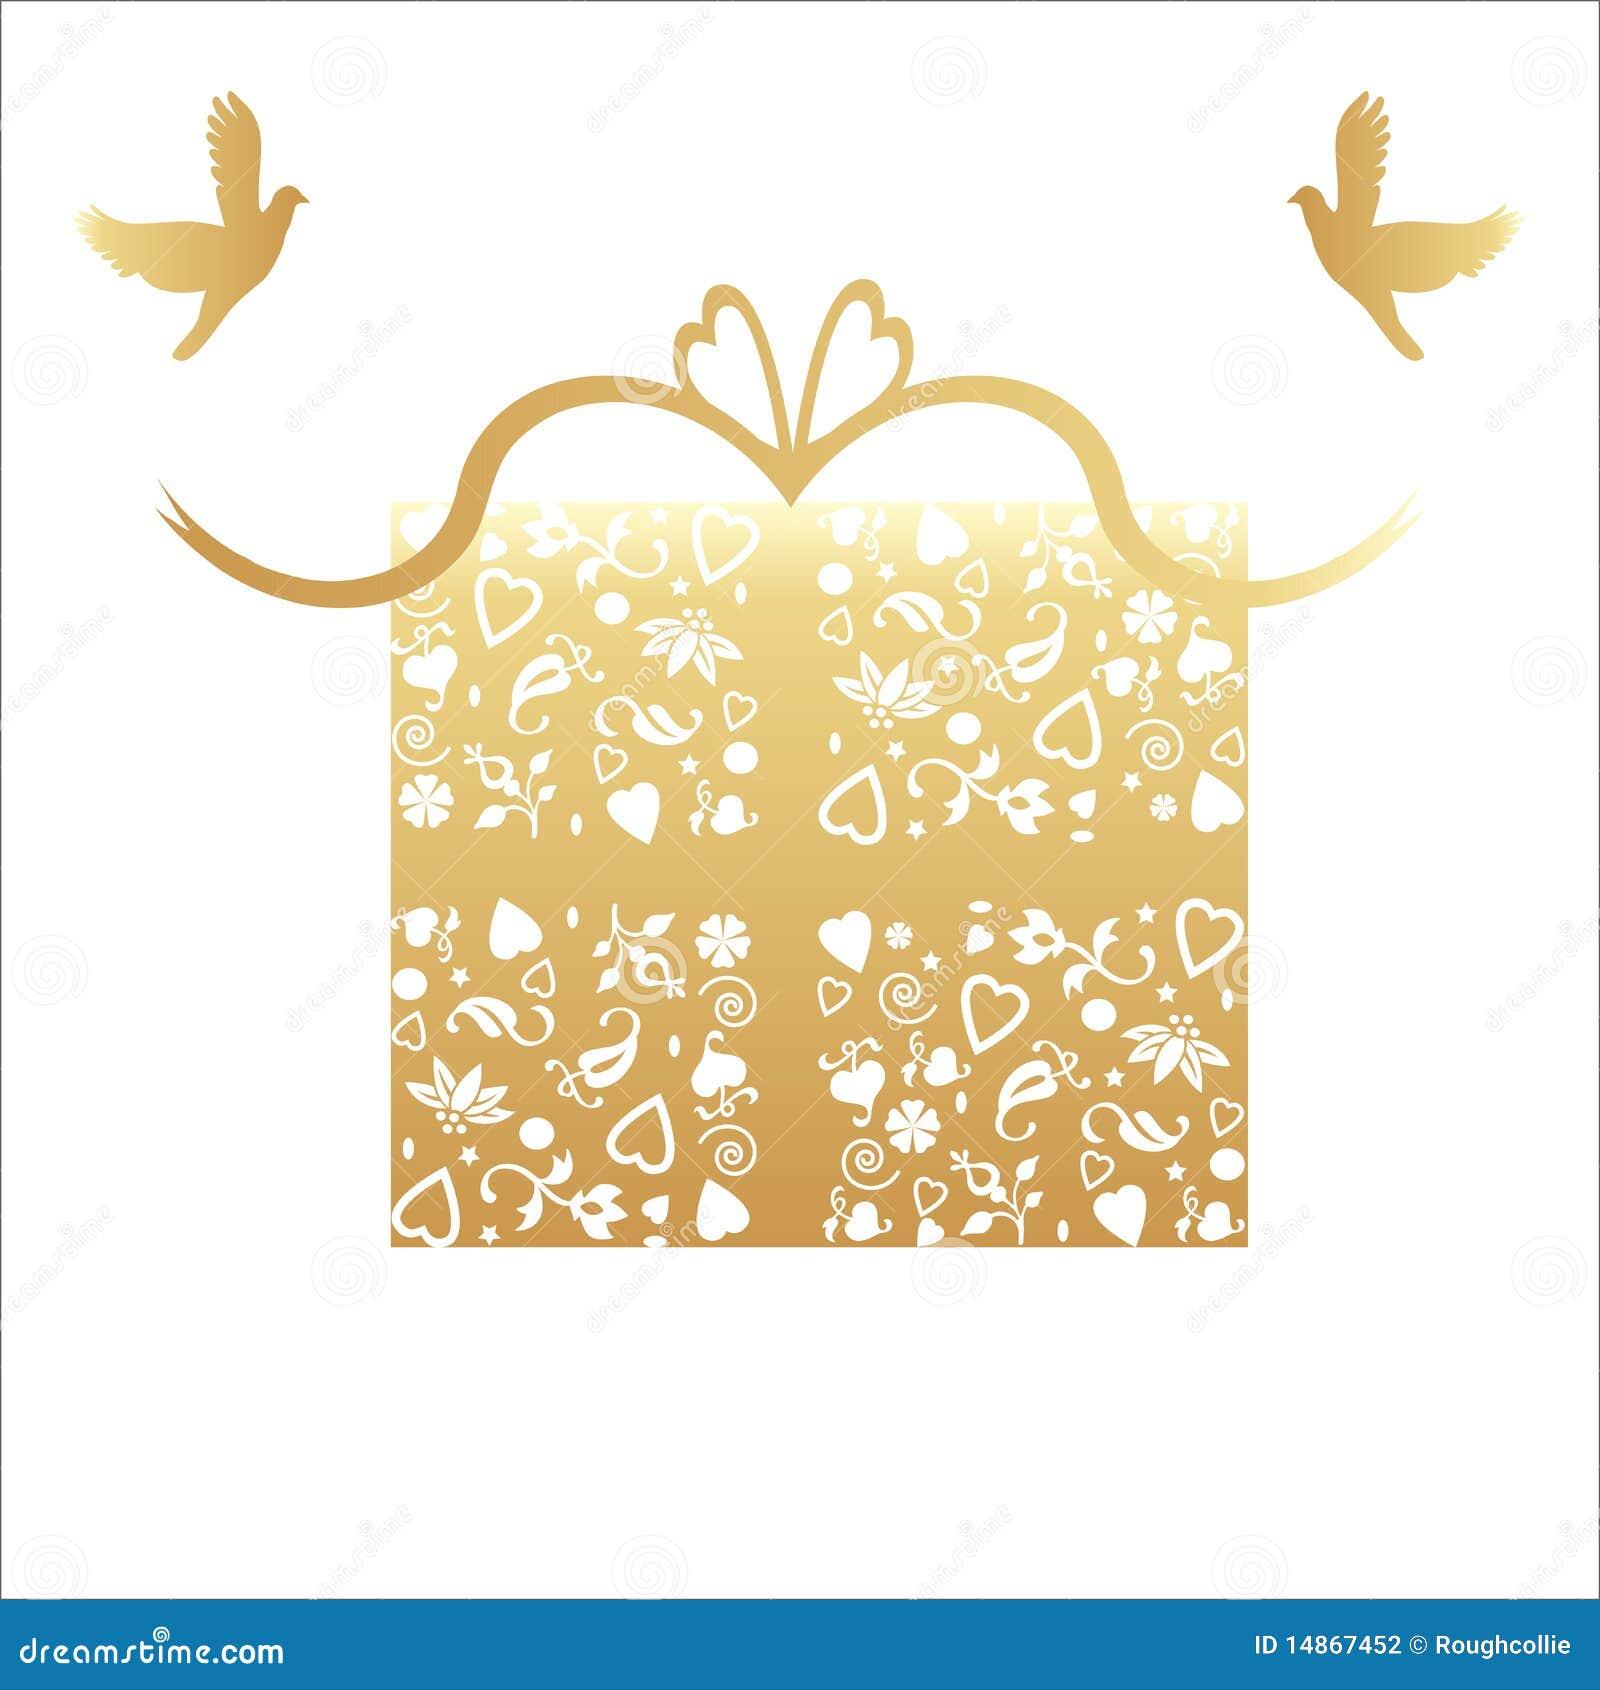 Wedding Present Gift Card : Luxury 50th Golden Wedding Anniversary present / gift card concept ...